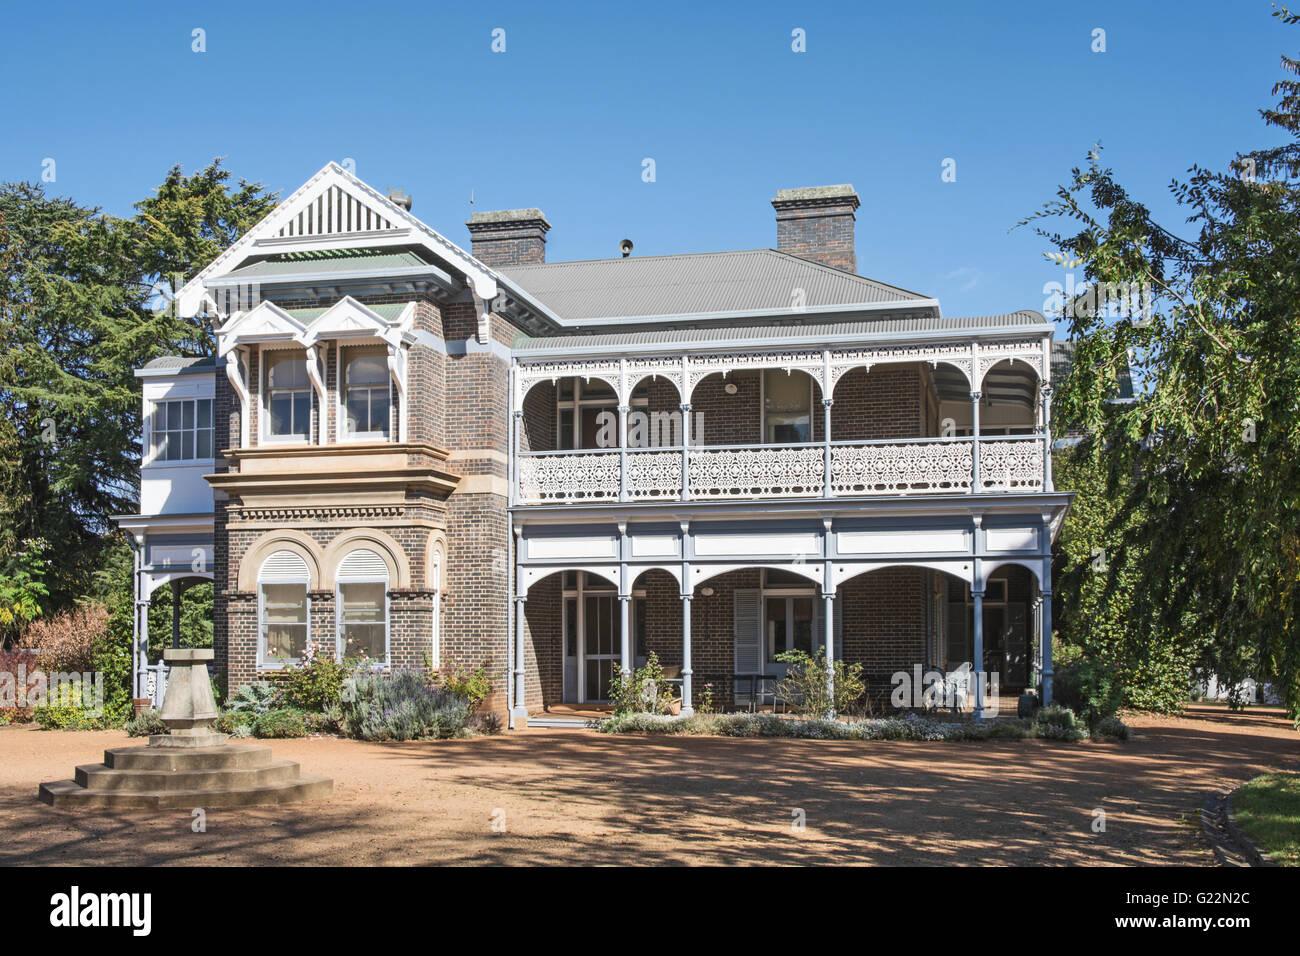 Saumarez Homestead, a National Trust building at Armidale NSW Australia - Stock Image